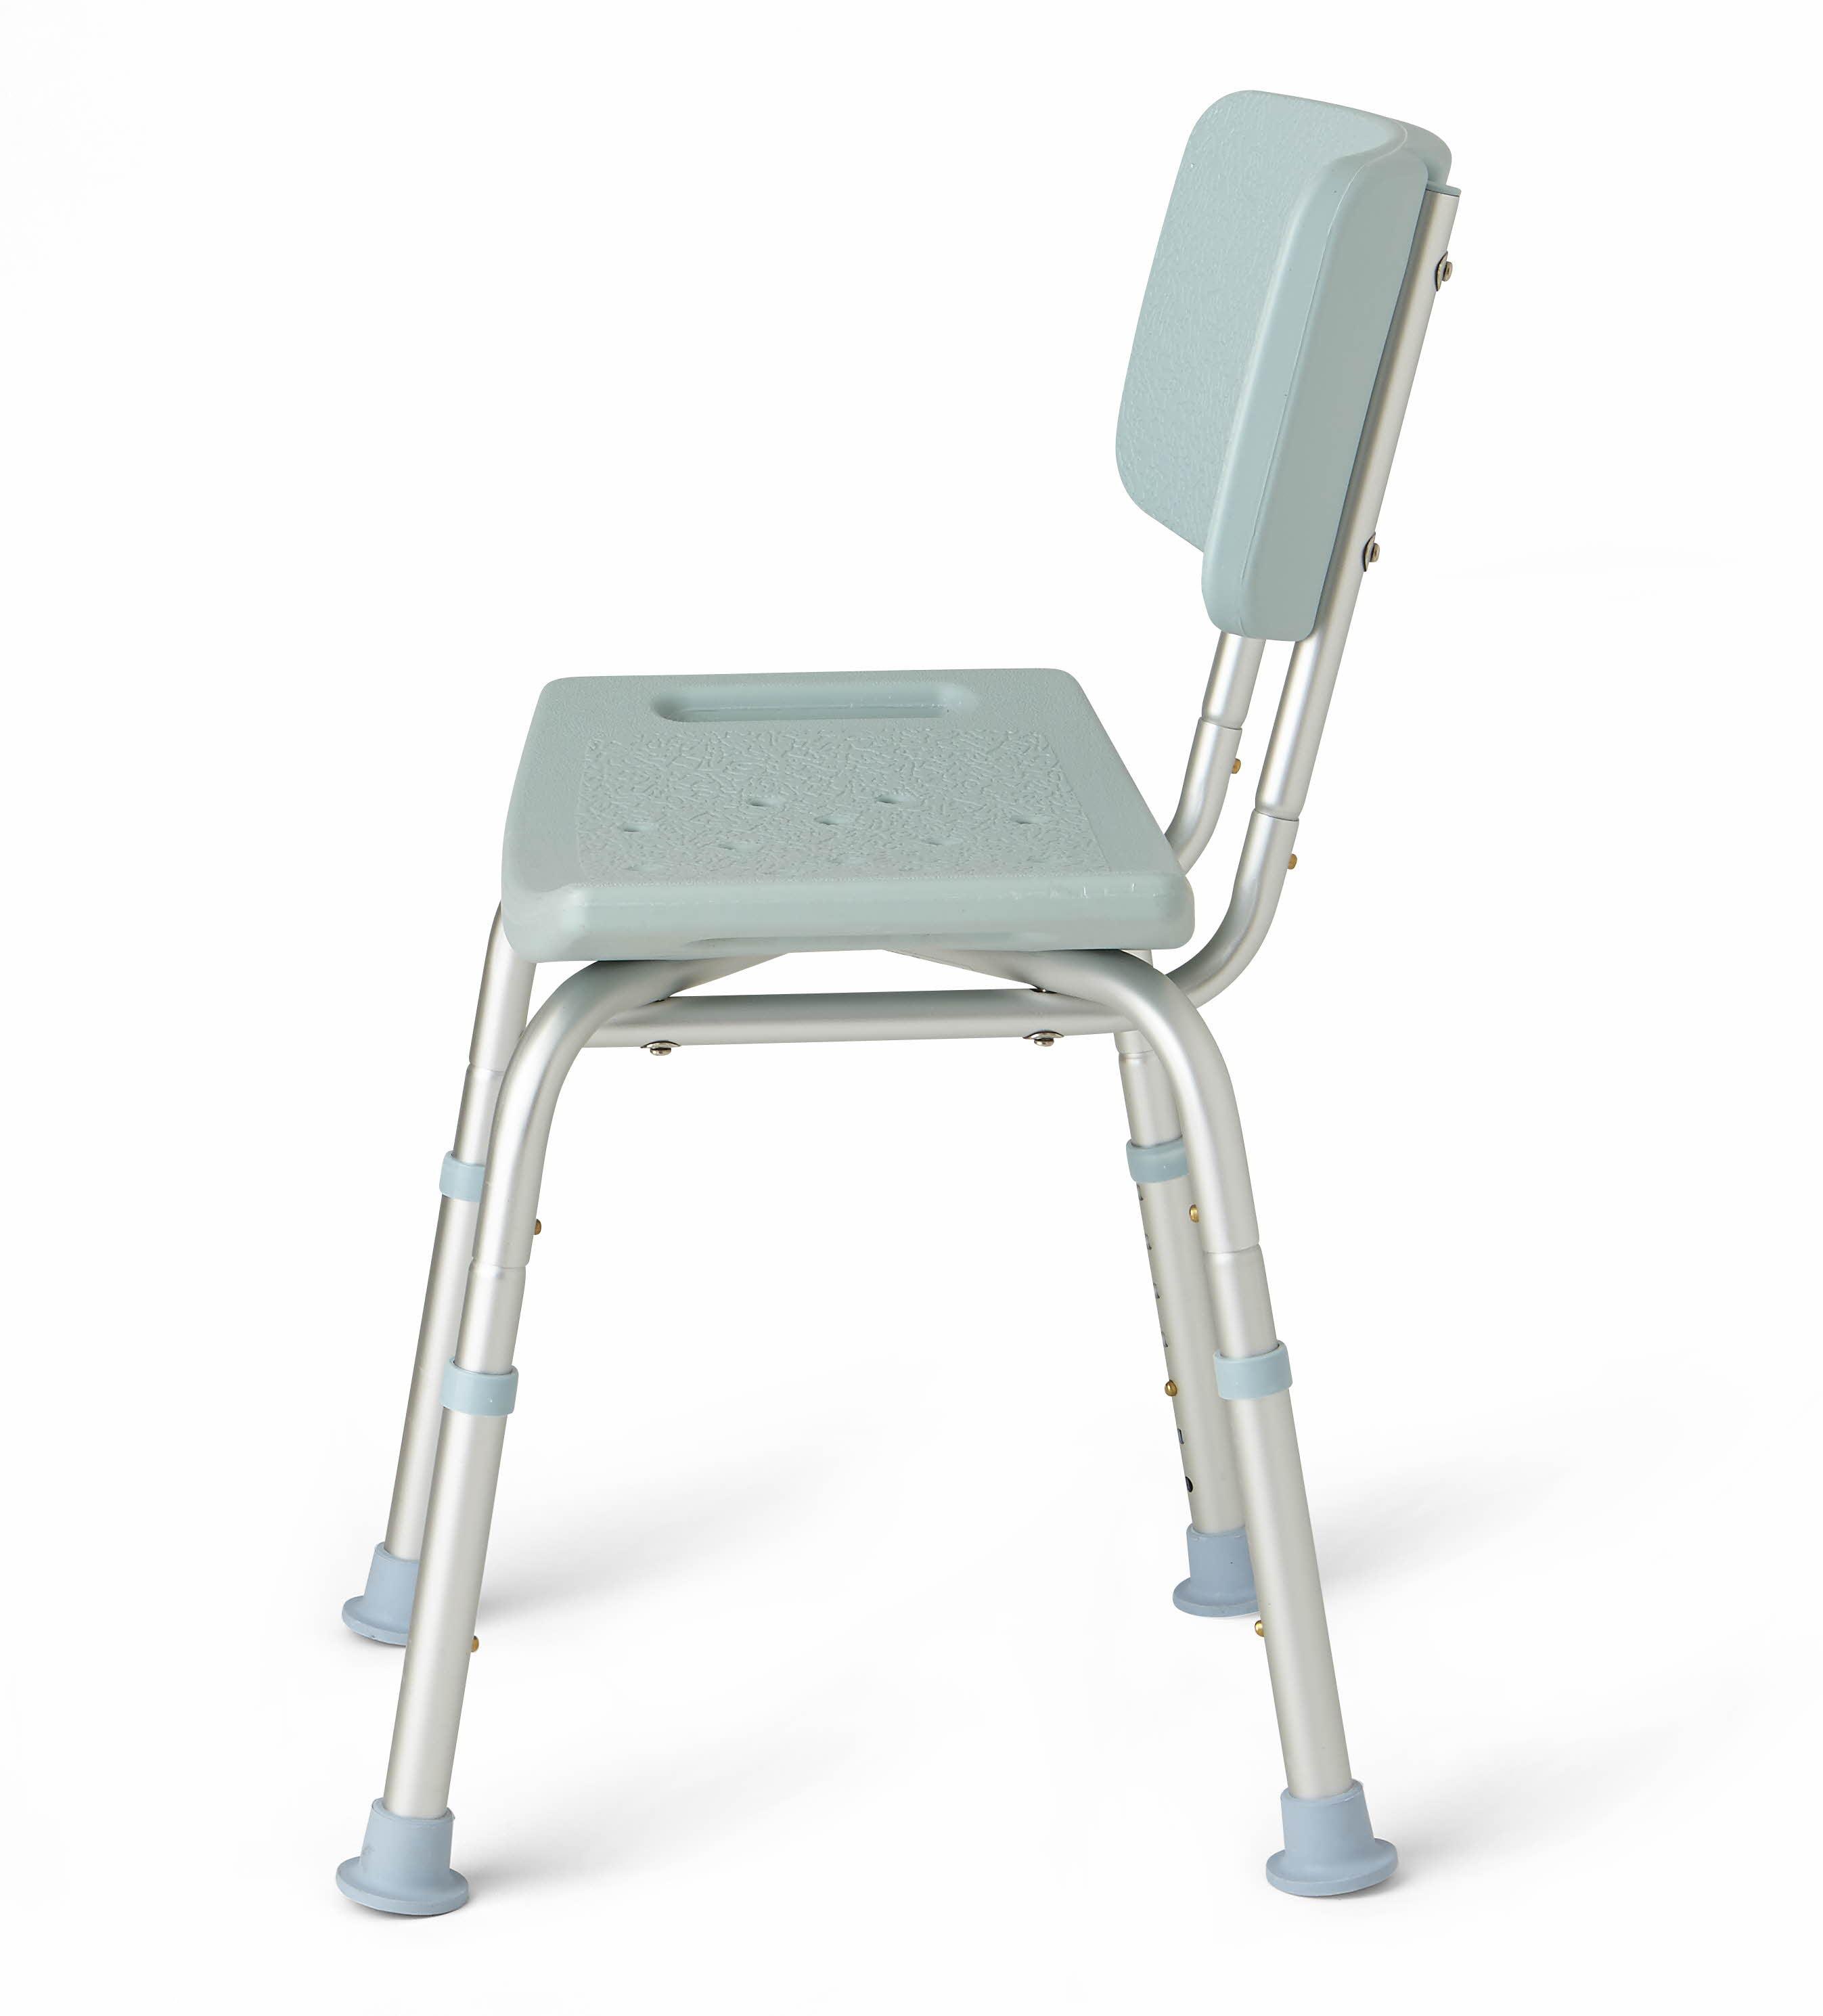 Medline Bath Chair with Microban Antimicrobial Treatment - Walmart com